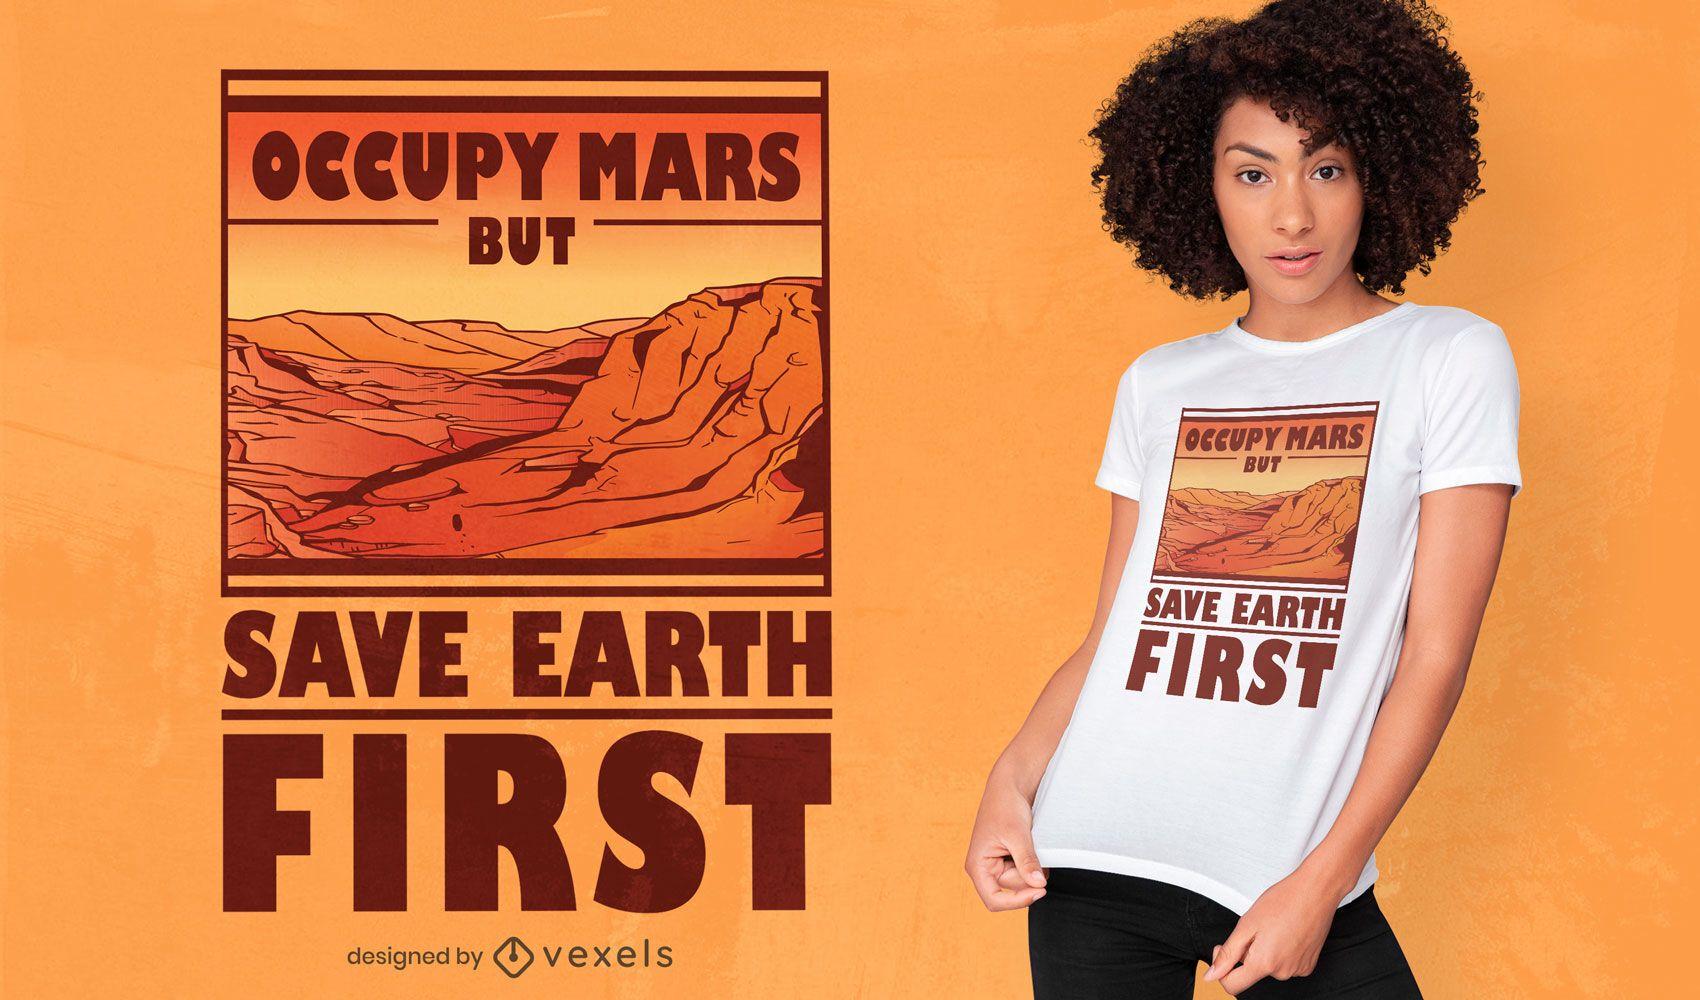 Occupy mars quote t-shirt design